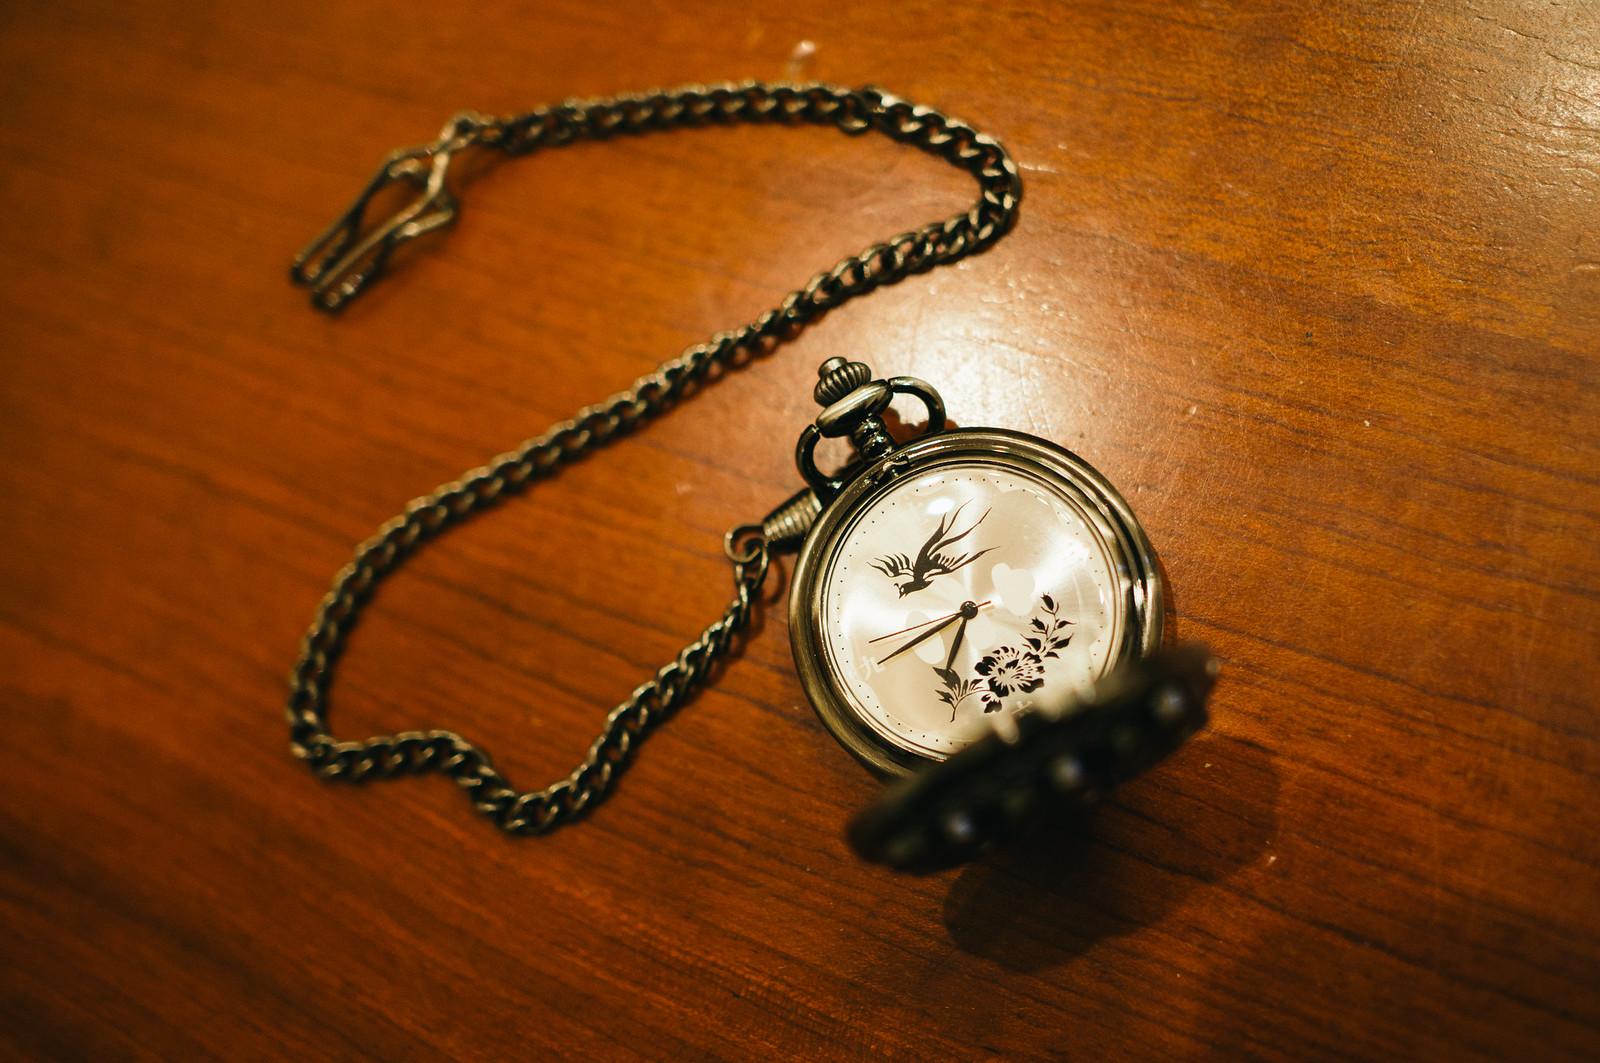 懐中時計「真田家 家紋・六連銭モデル」